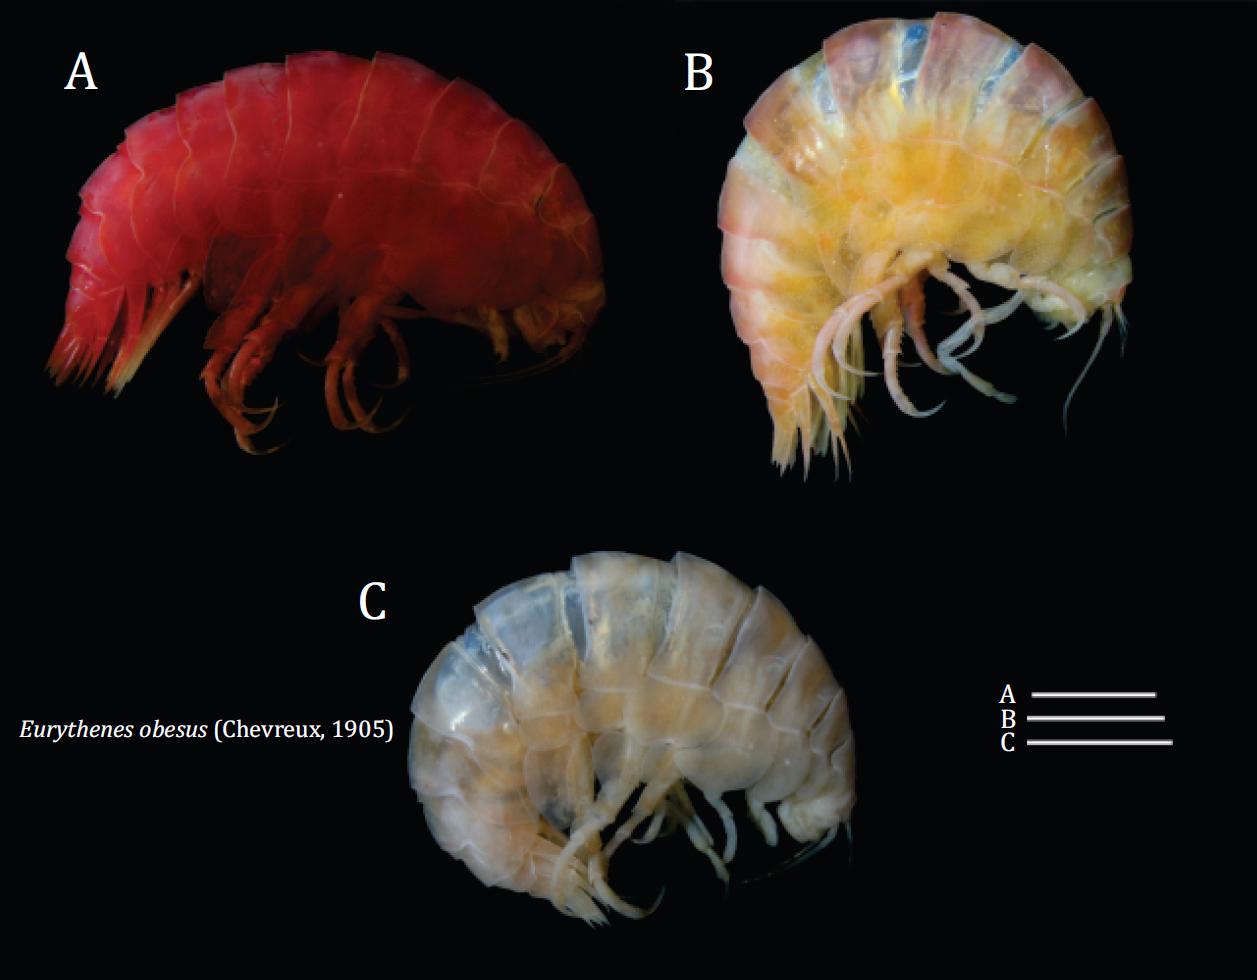 Further records of Eurythenes obesus (Chevreux, 1905) (Crustacea: Amphipoda: Eurytheneidae) from Brazilian deep waters